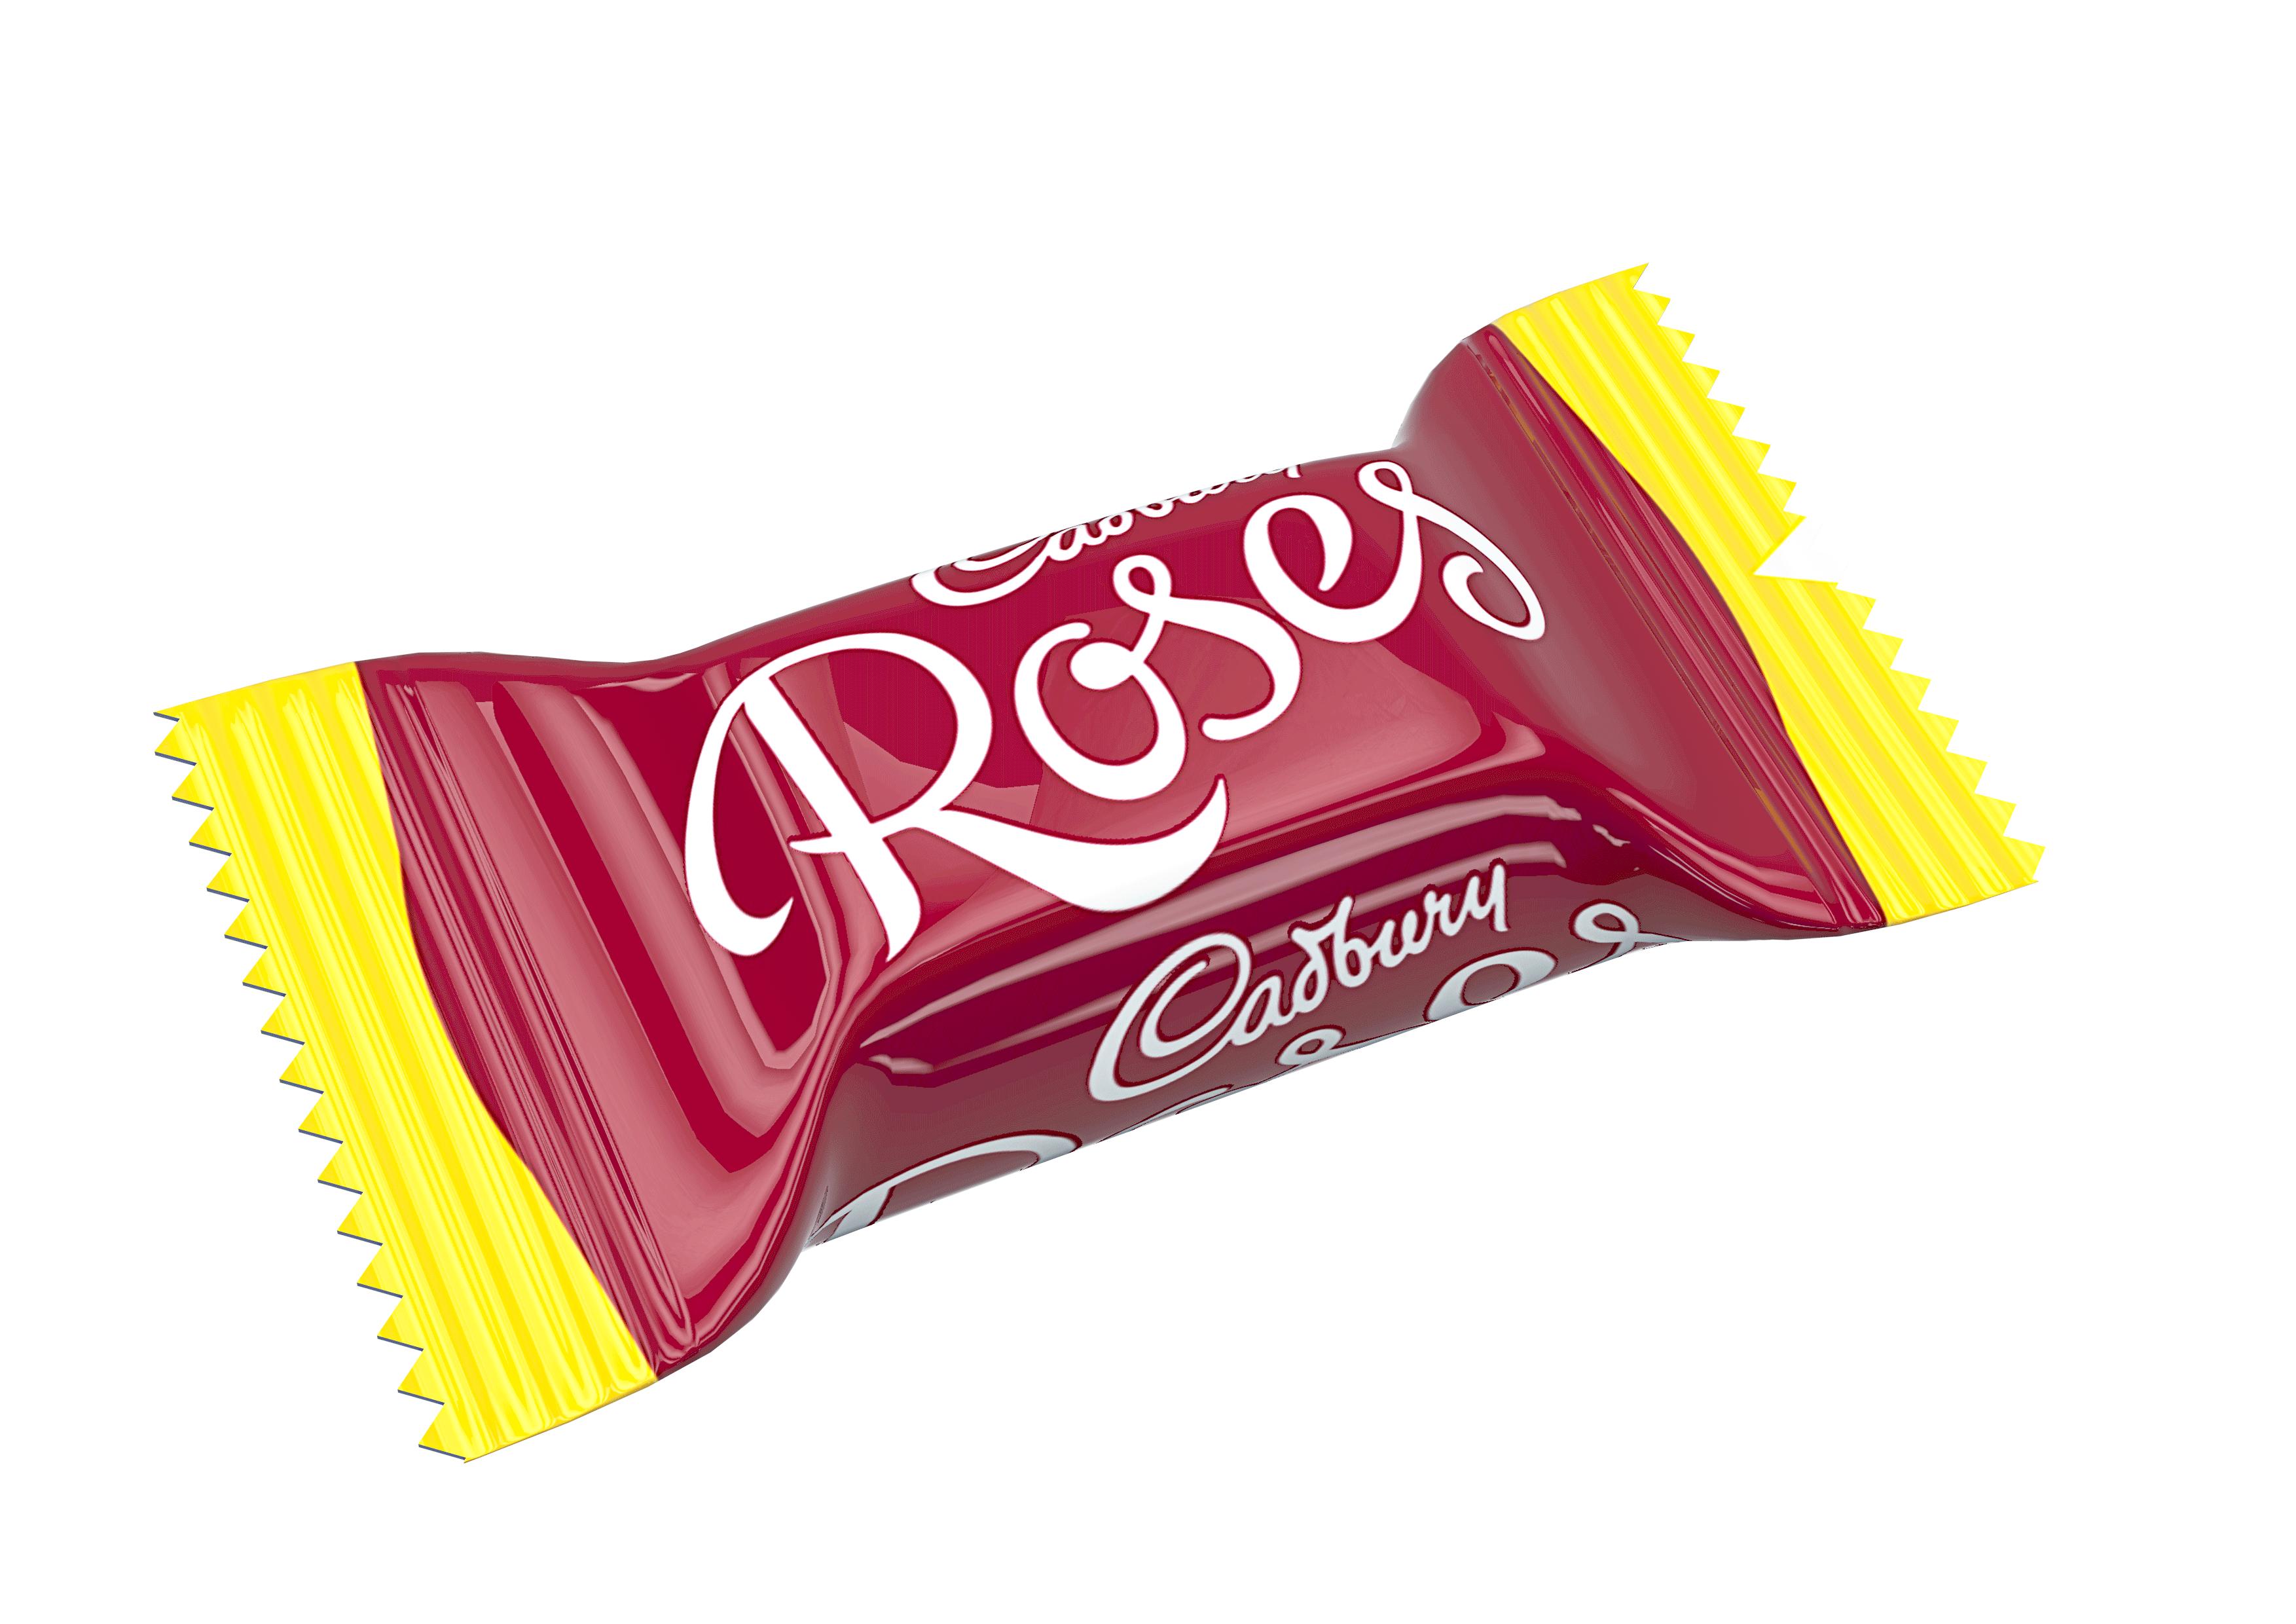 Cadbury Roses Chocolate Bonbon Packaging Chocolate & Candy